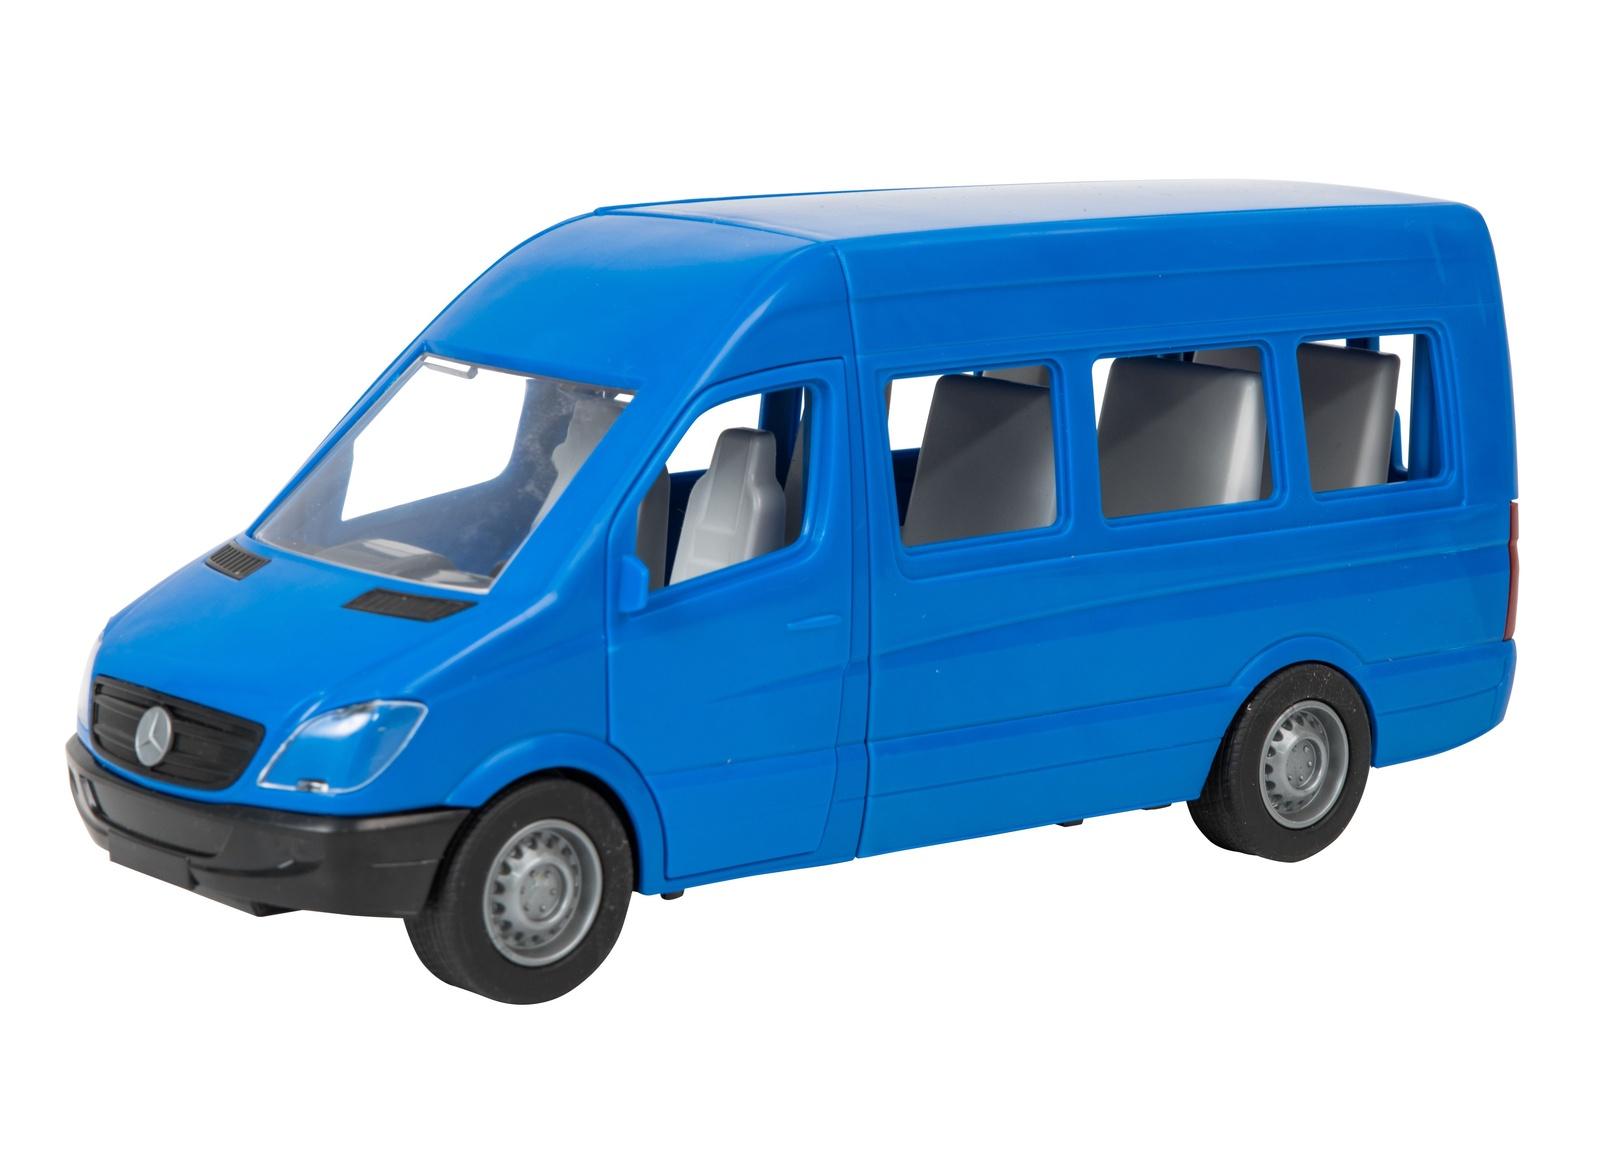 Машинка-игрушка Tigres Mercedes-Benz Sprinter пассажирский синий